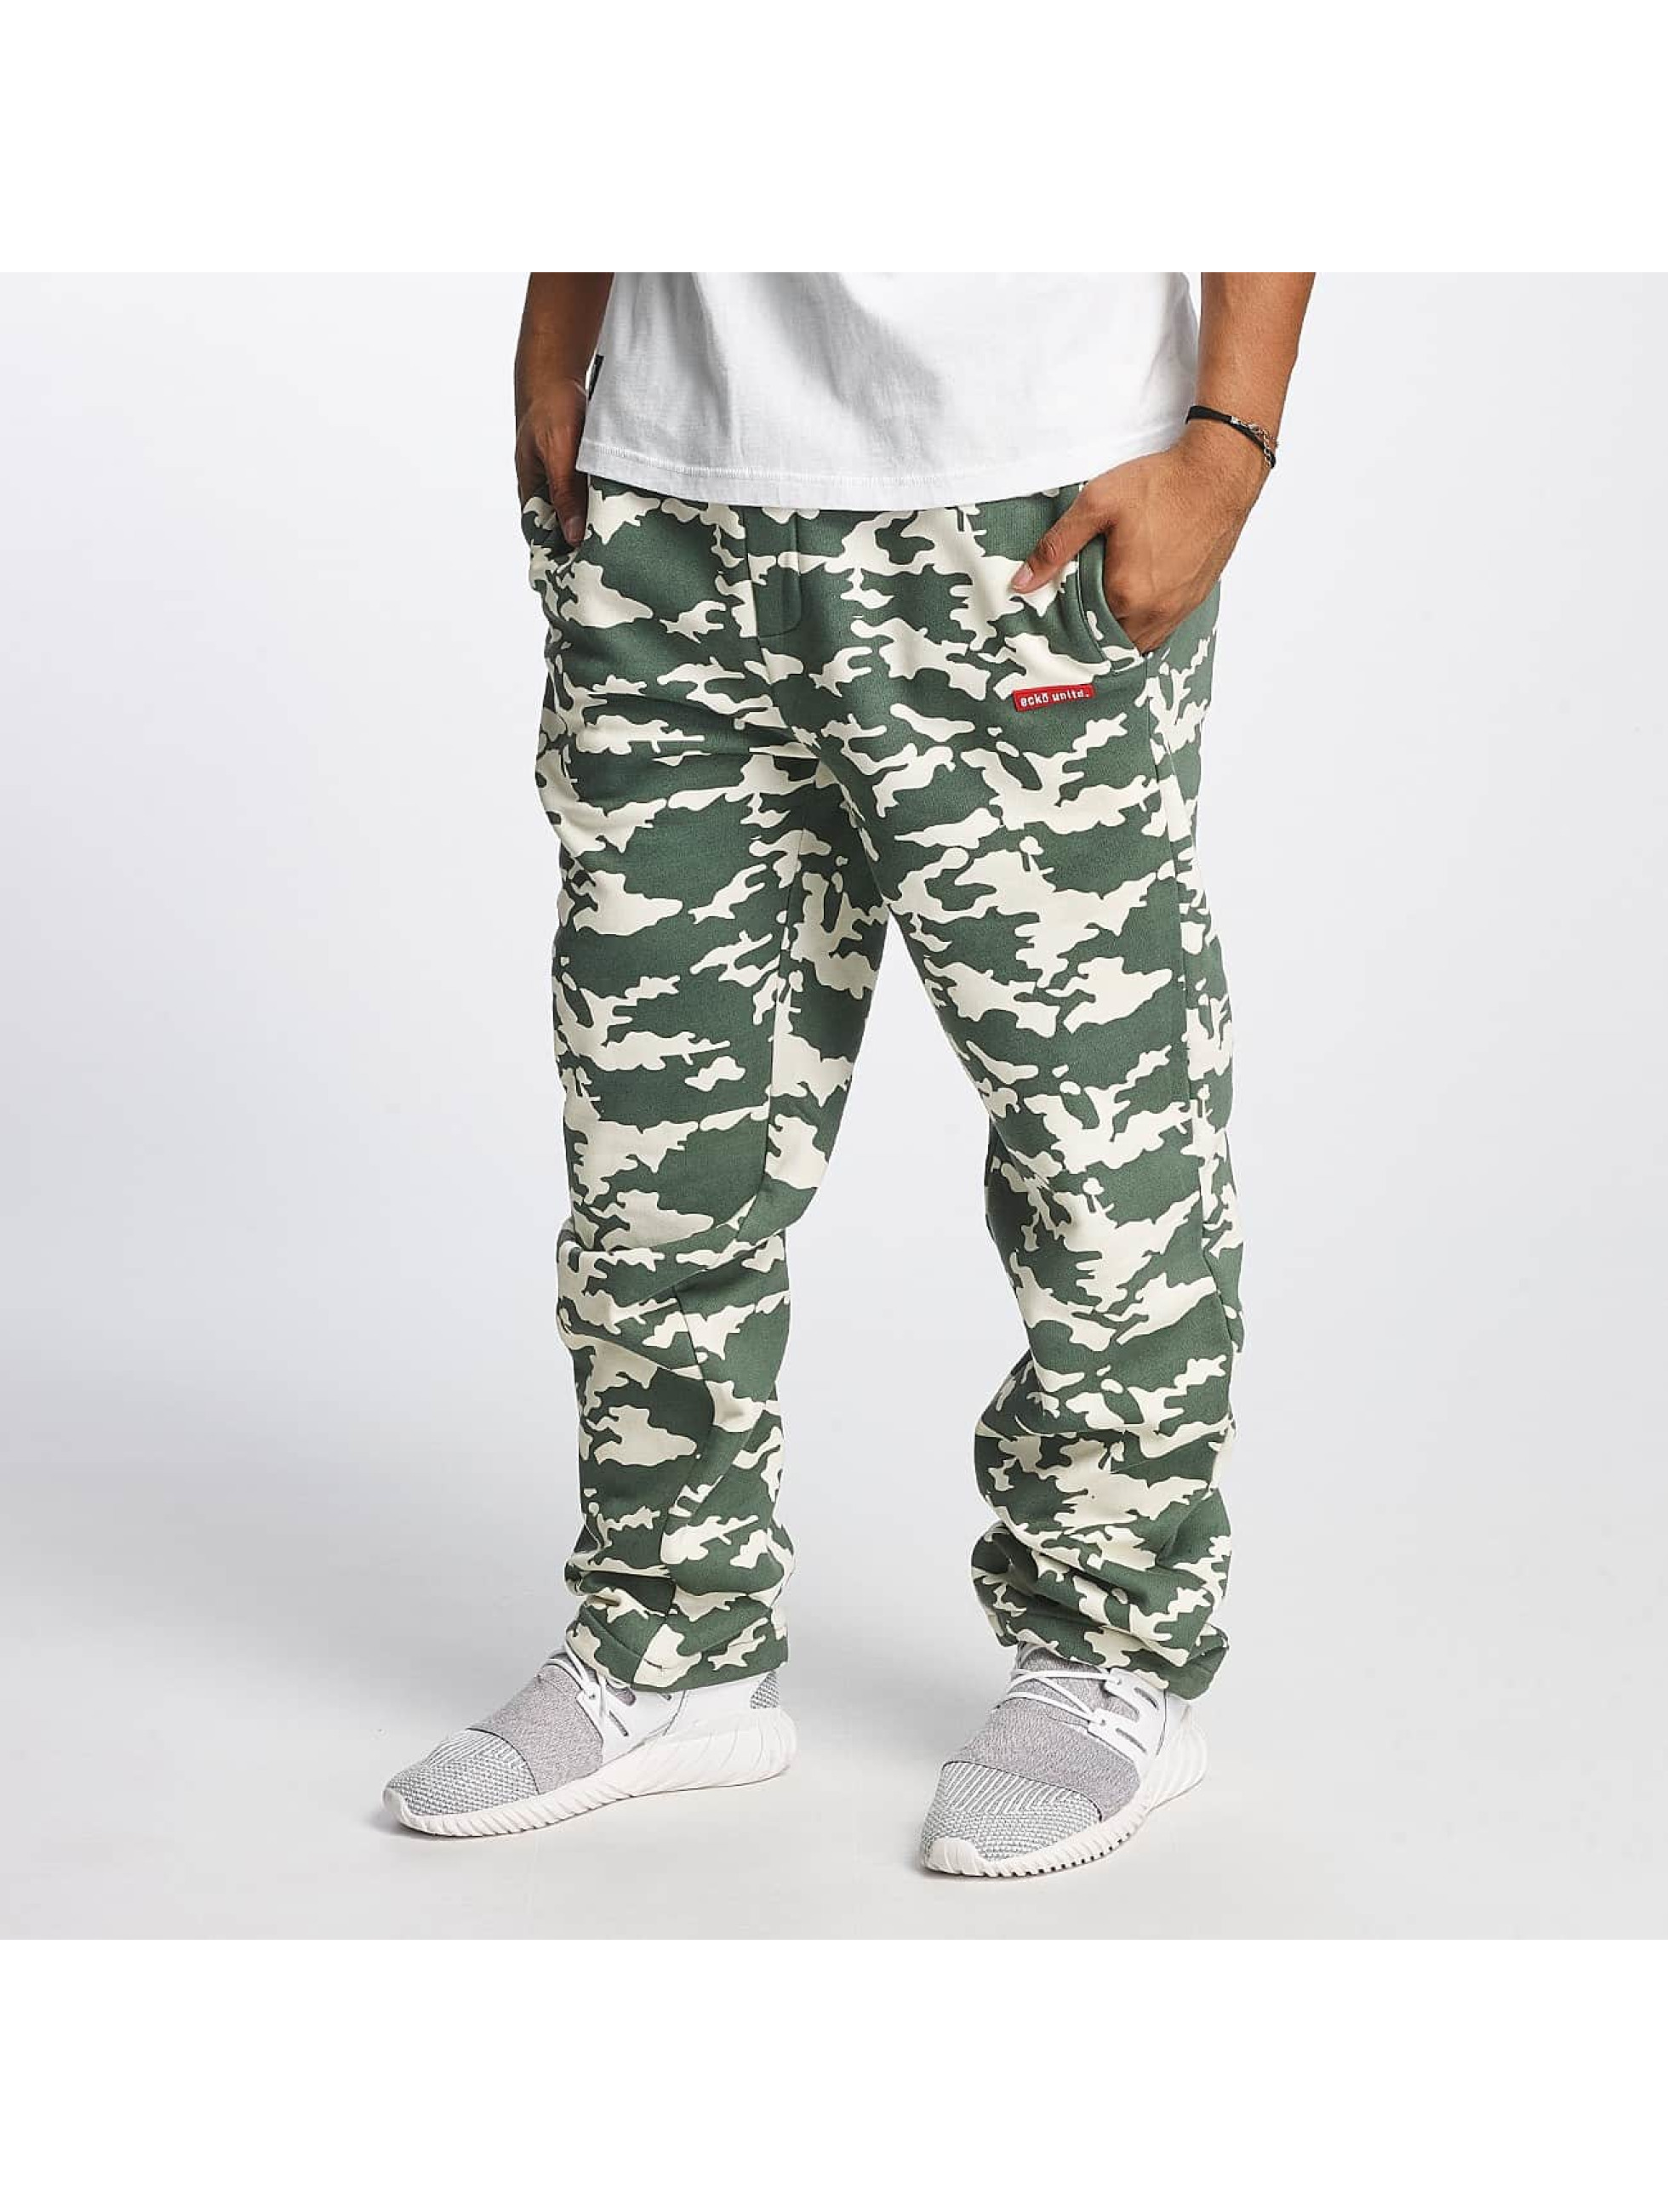 Ecko Unltd. / Sweat Pant BananaBeach in camouflage XL